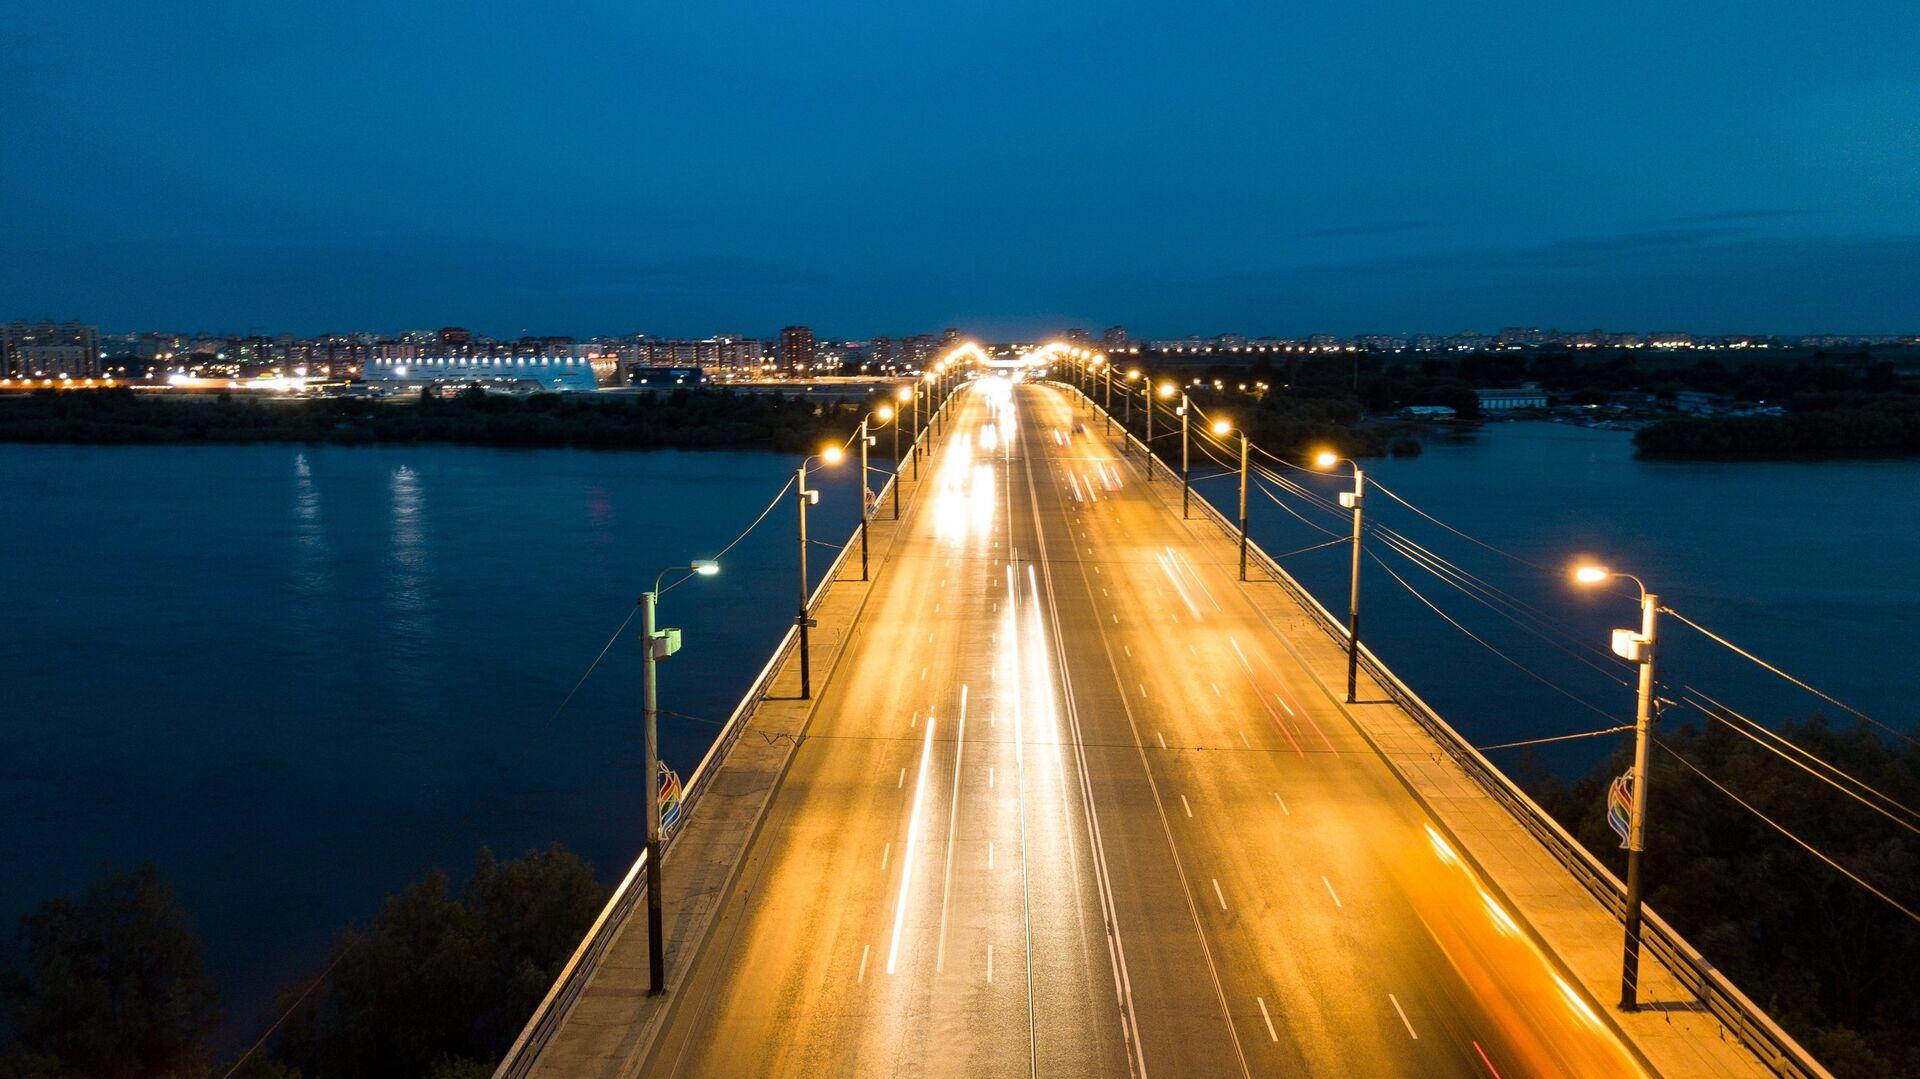 Мост имени 60-летия ВЛКСМ в Омске - РИА Новости, 1920, 19.11.2020